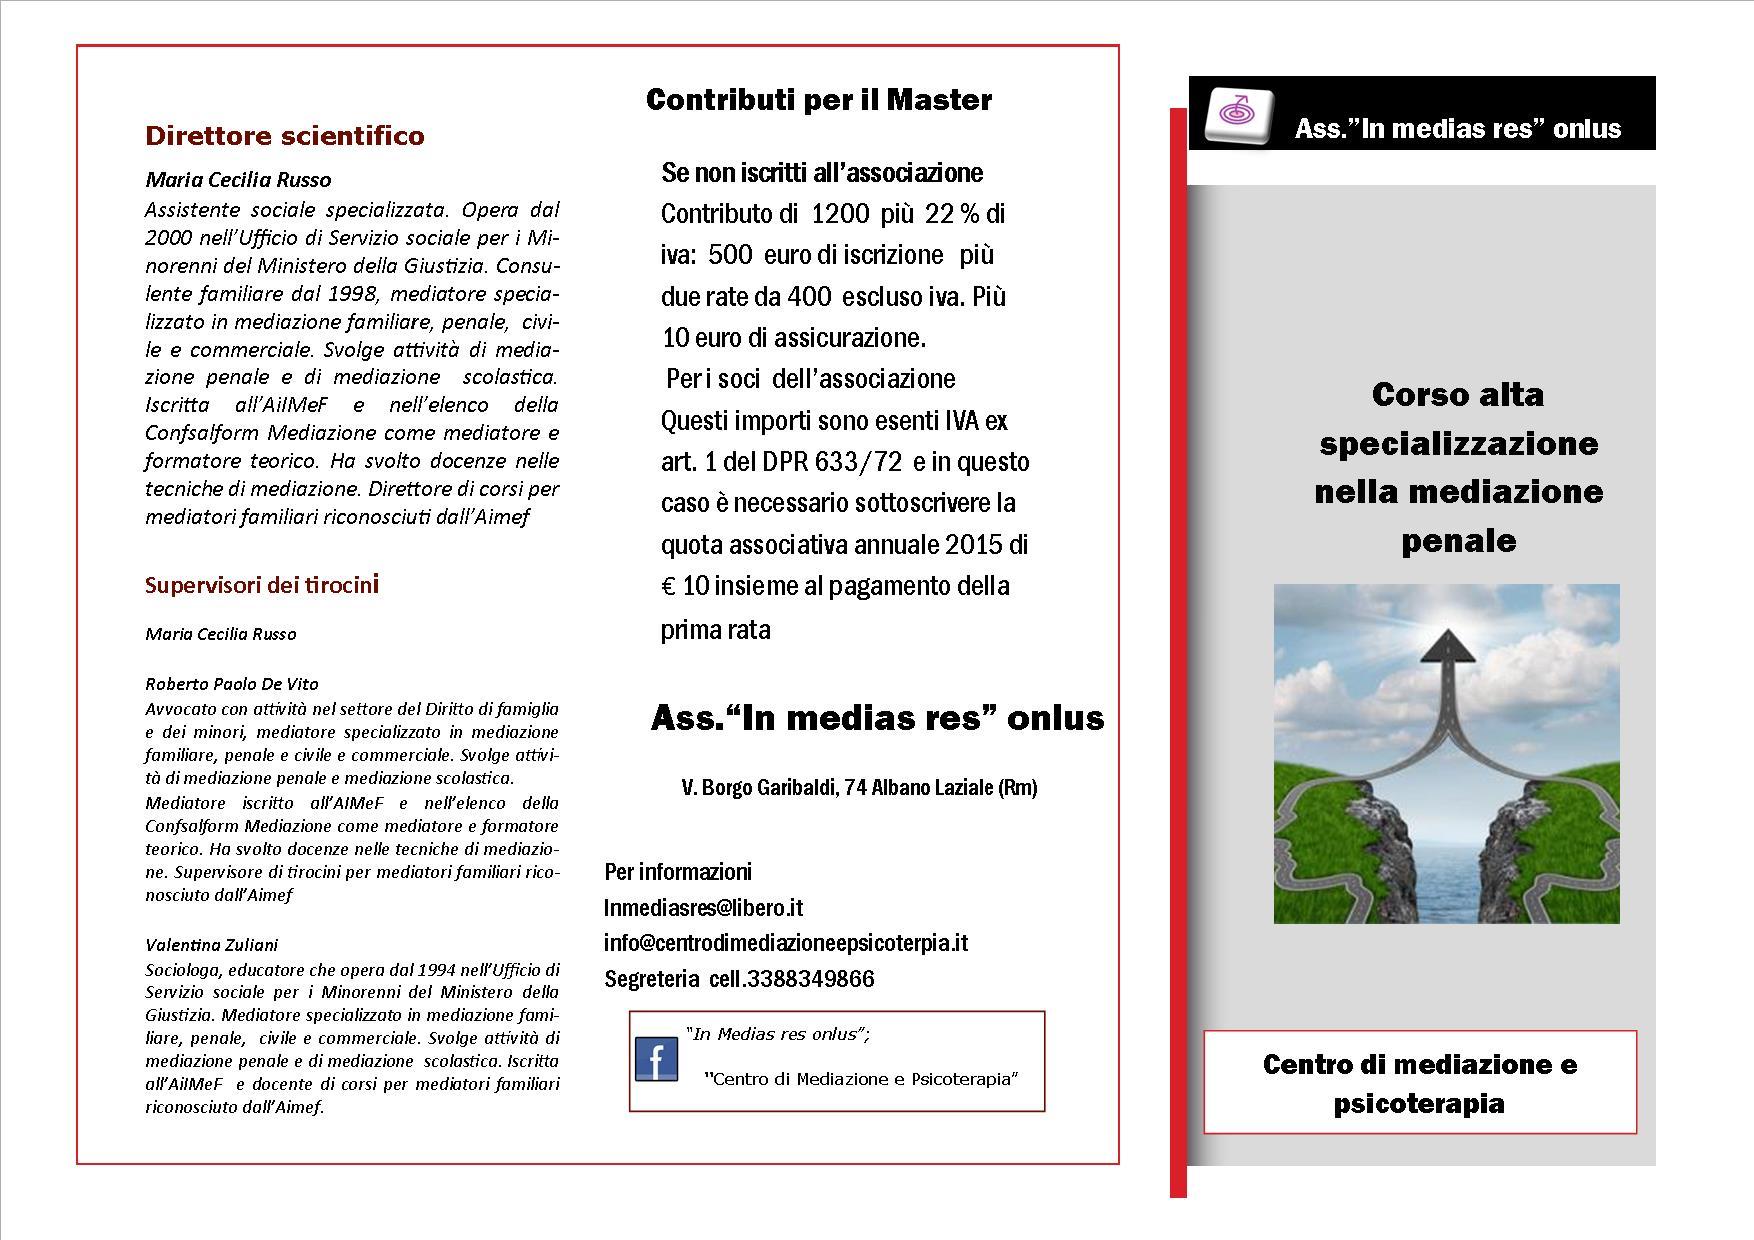 brochure corso Alta specializz med penale